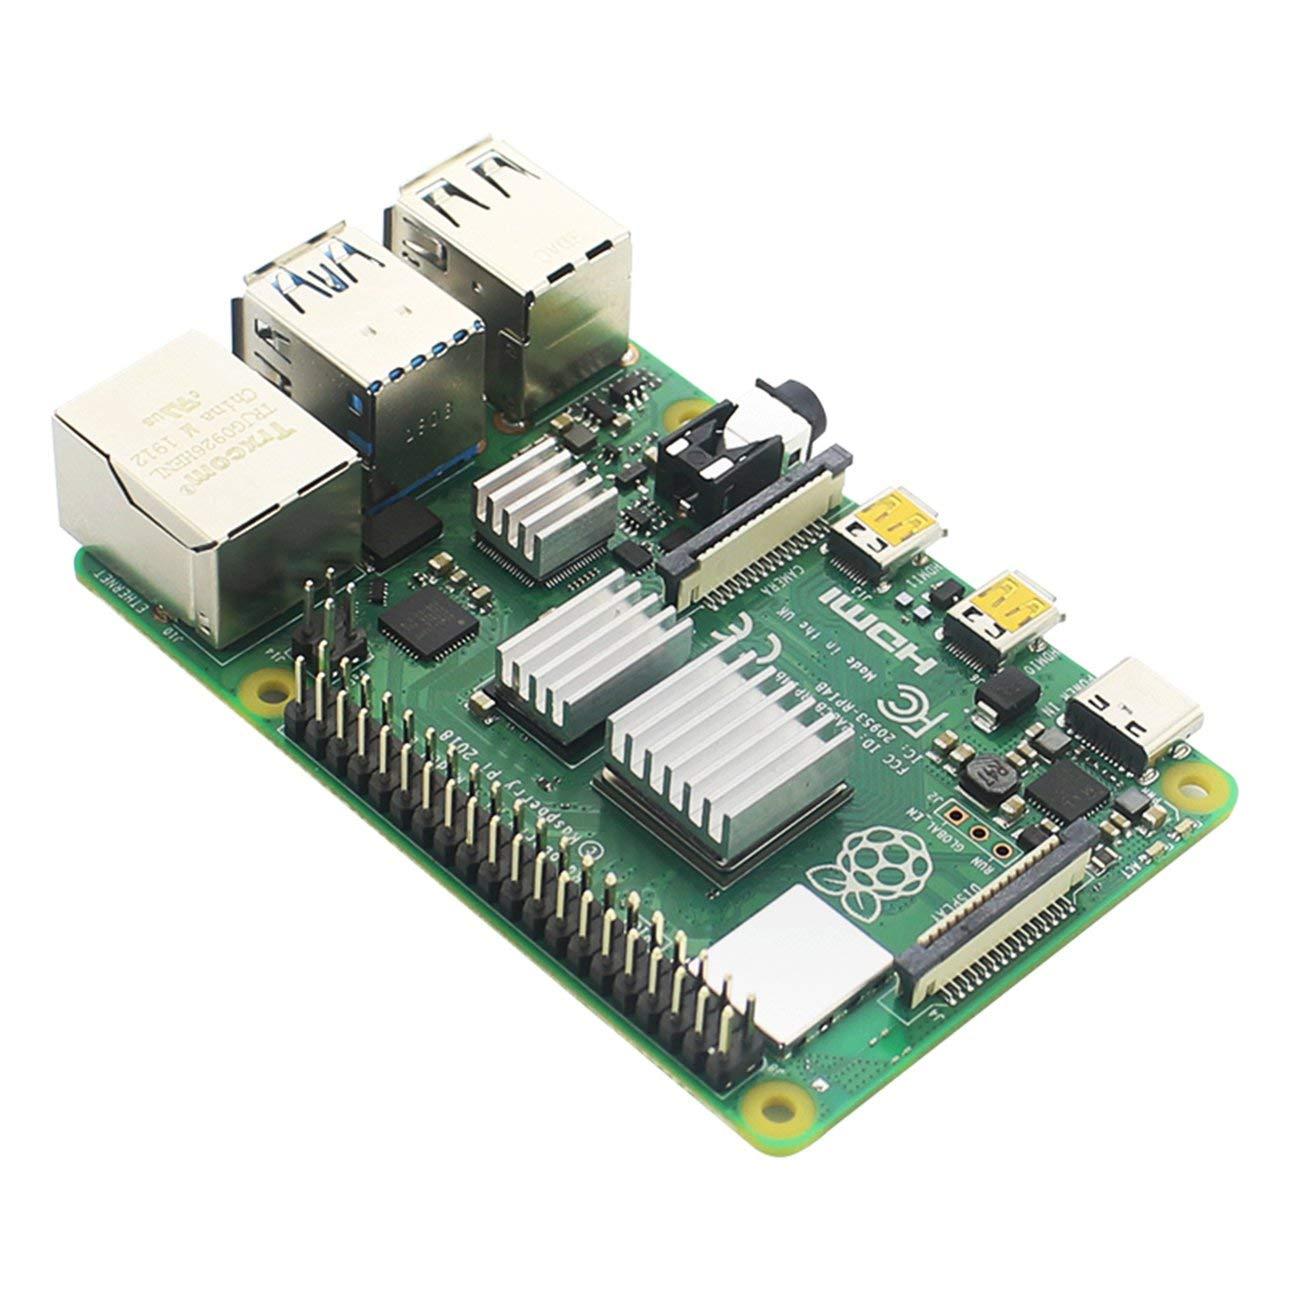 Celerhuak F/ür Raspberry Pi 4 Model B K/ühlk/örper 3 St/ück Raspberry Pi Heatsink Cooling